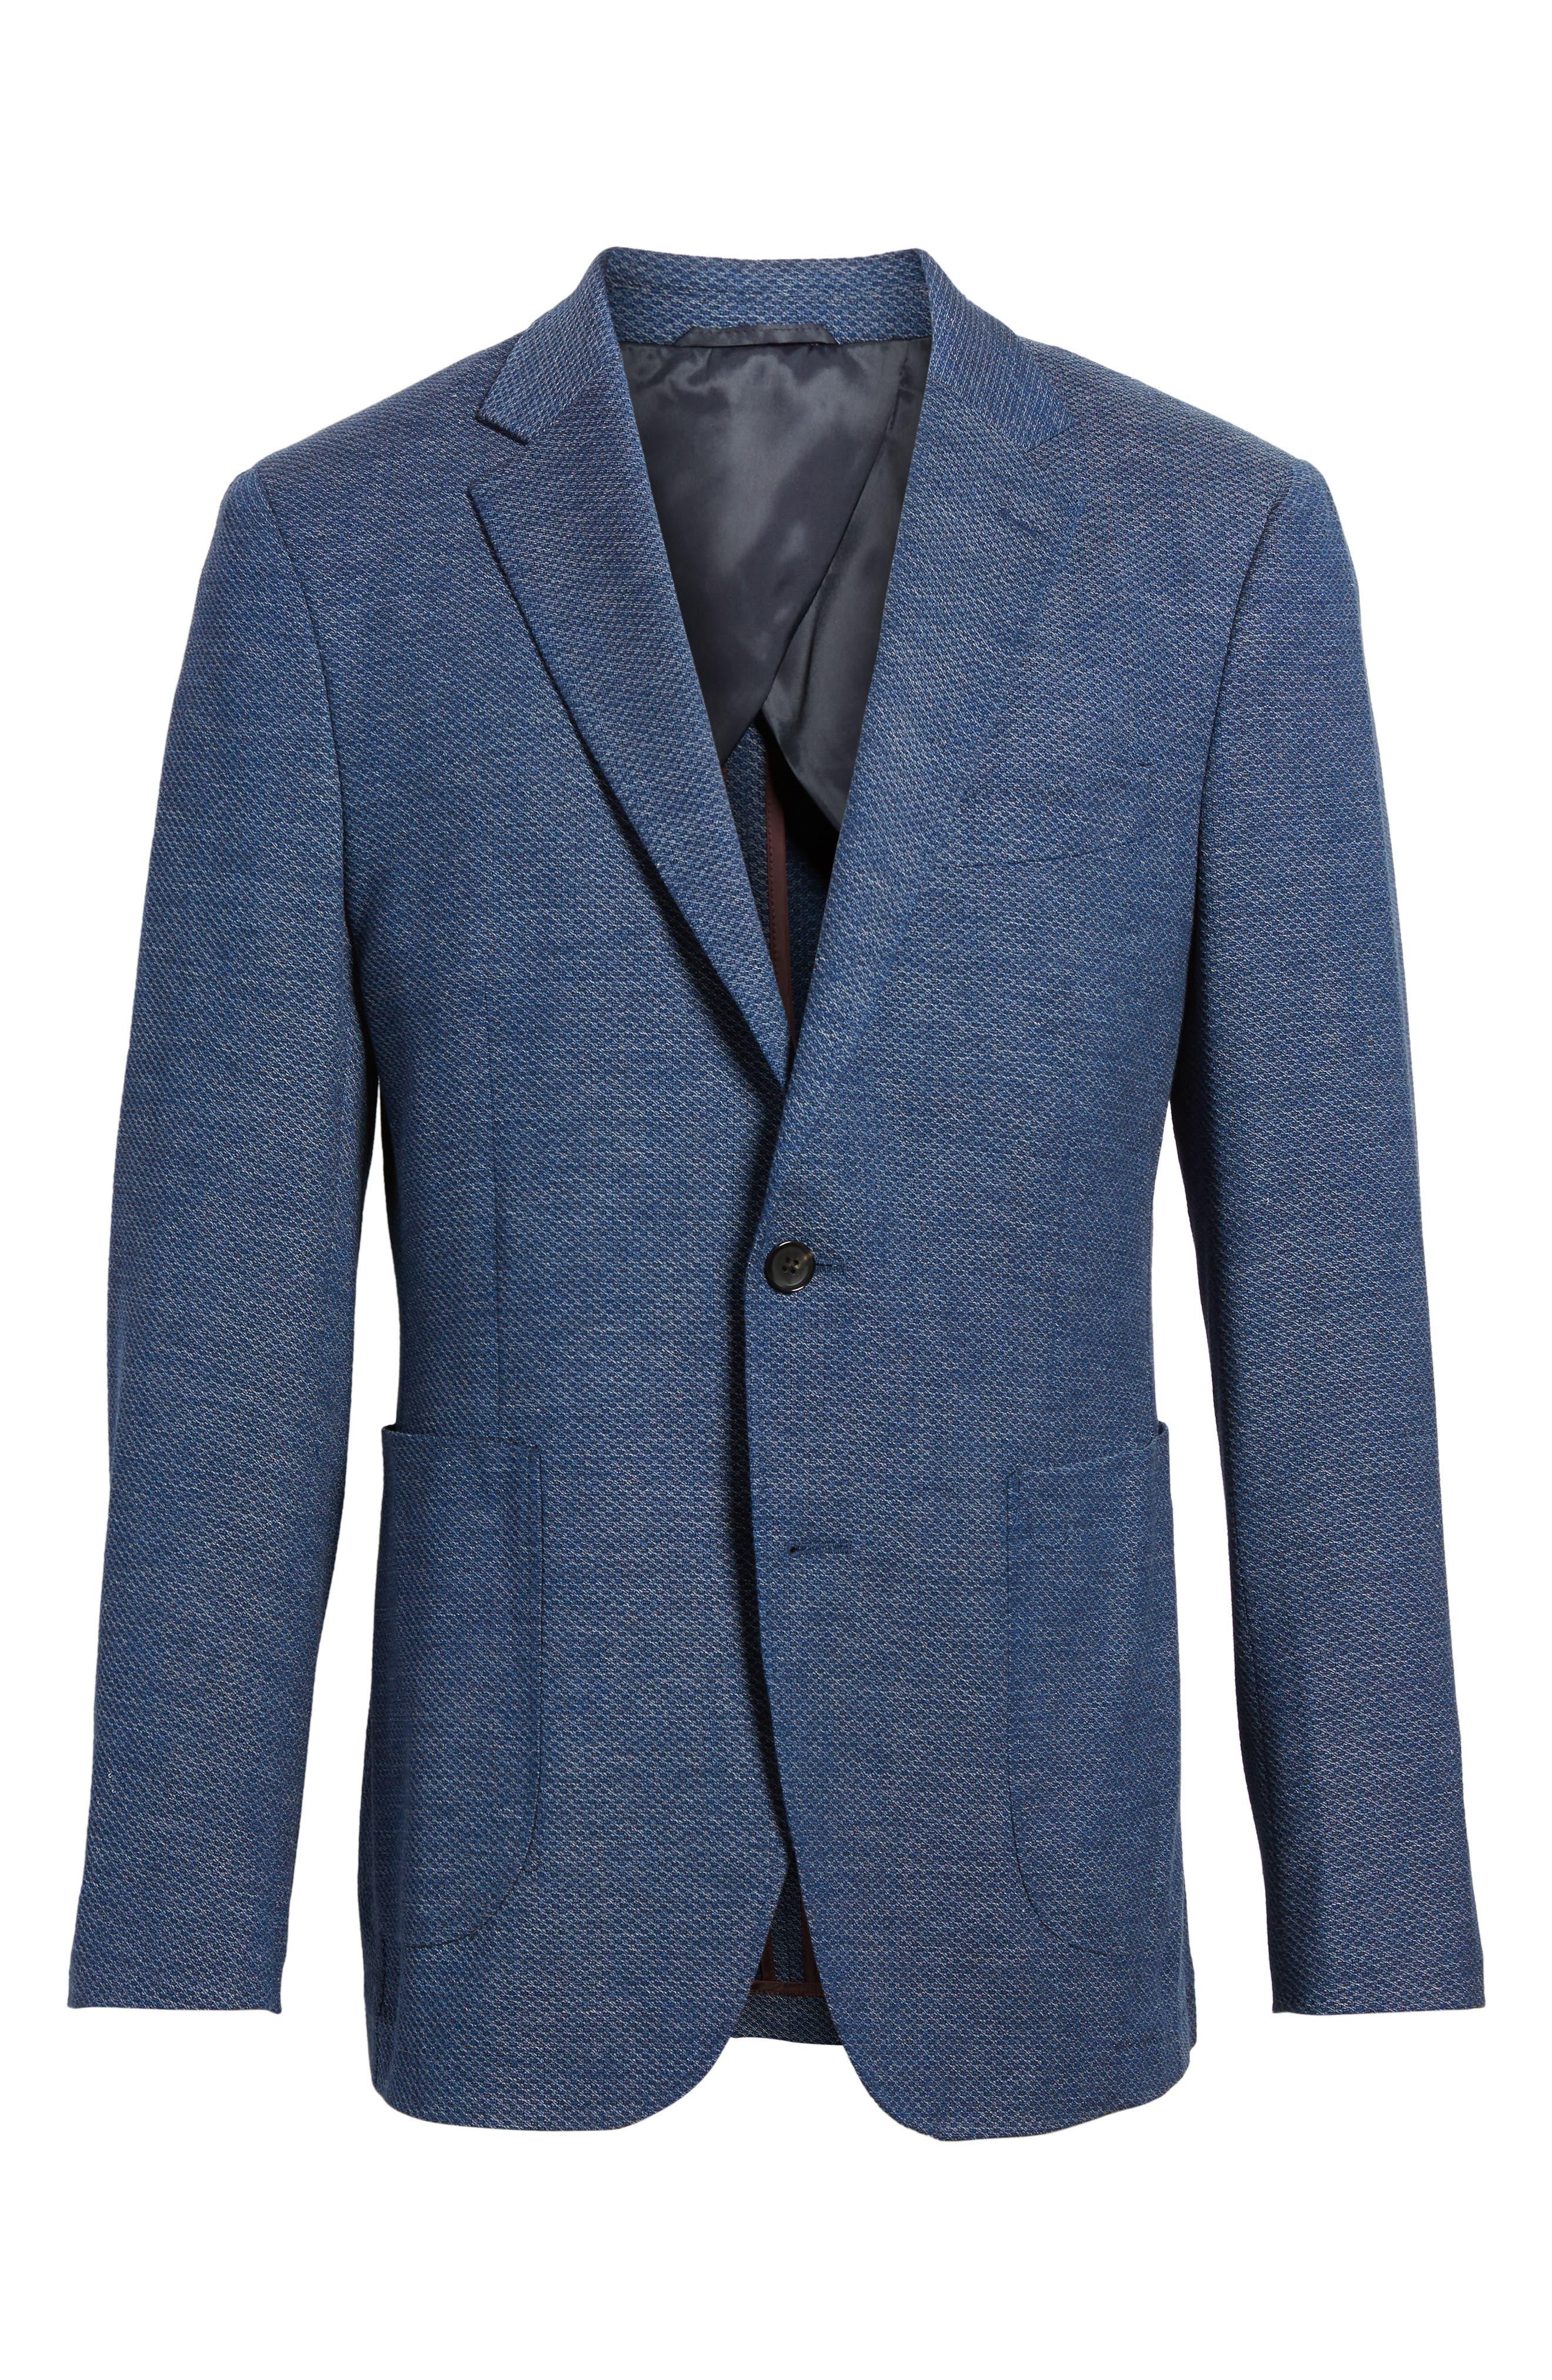 Fife Street Wool Blend Blazer,                             Alternate thumbnail 5, color,                             432